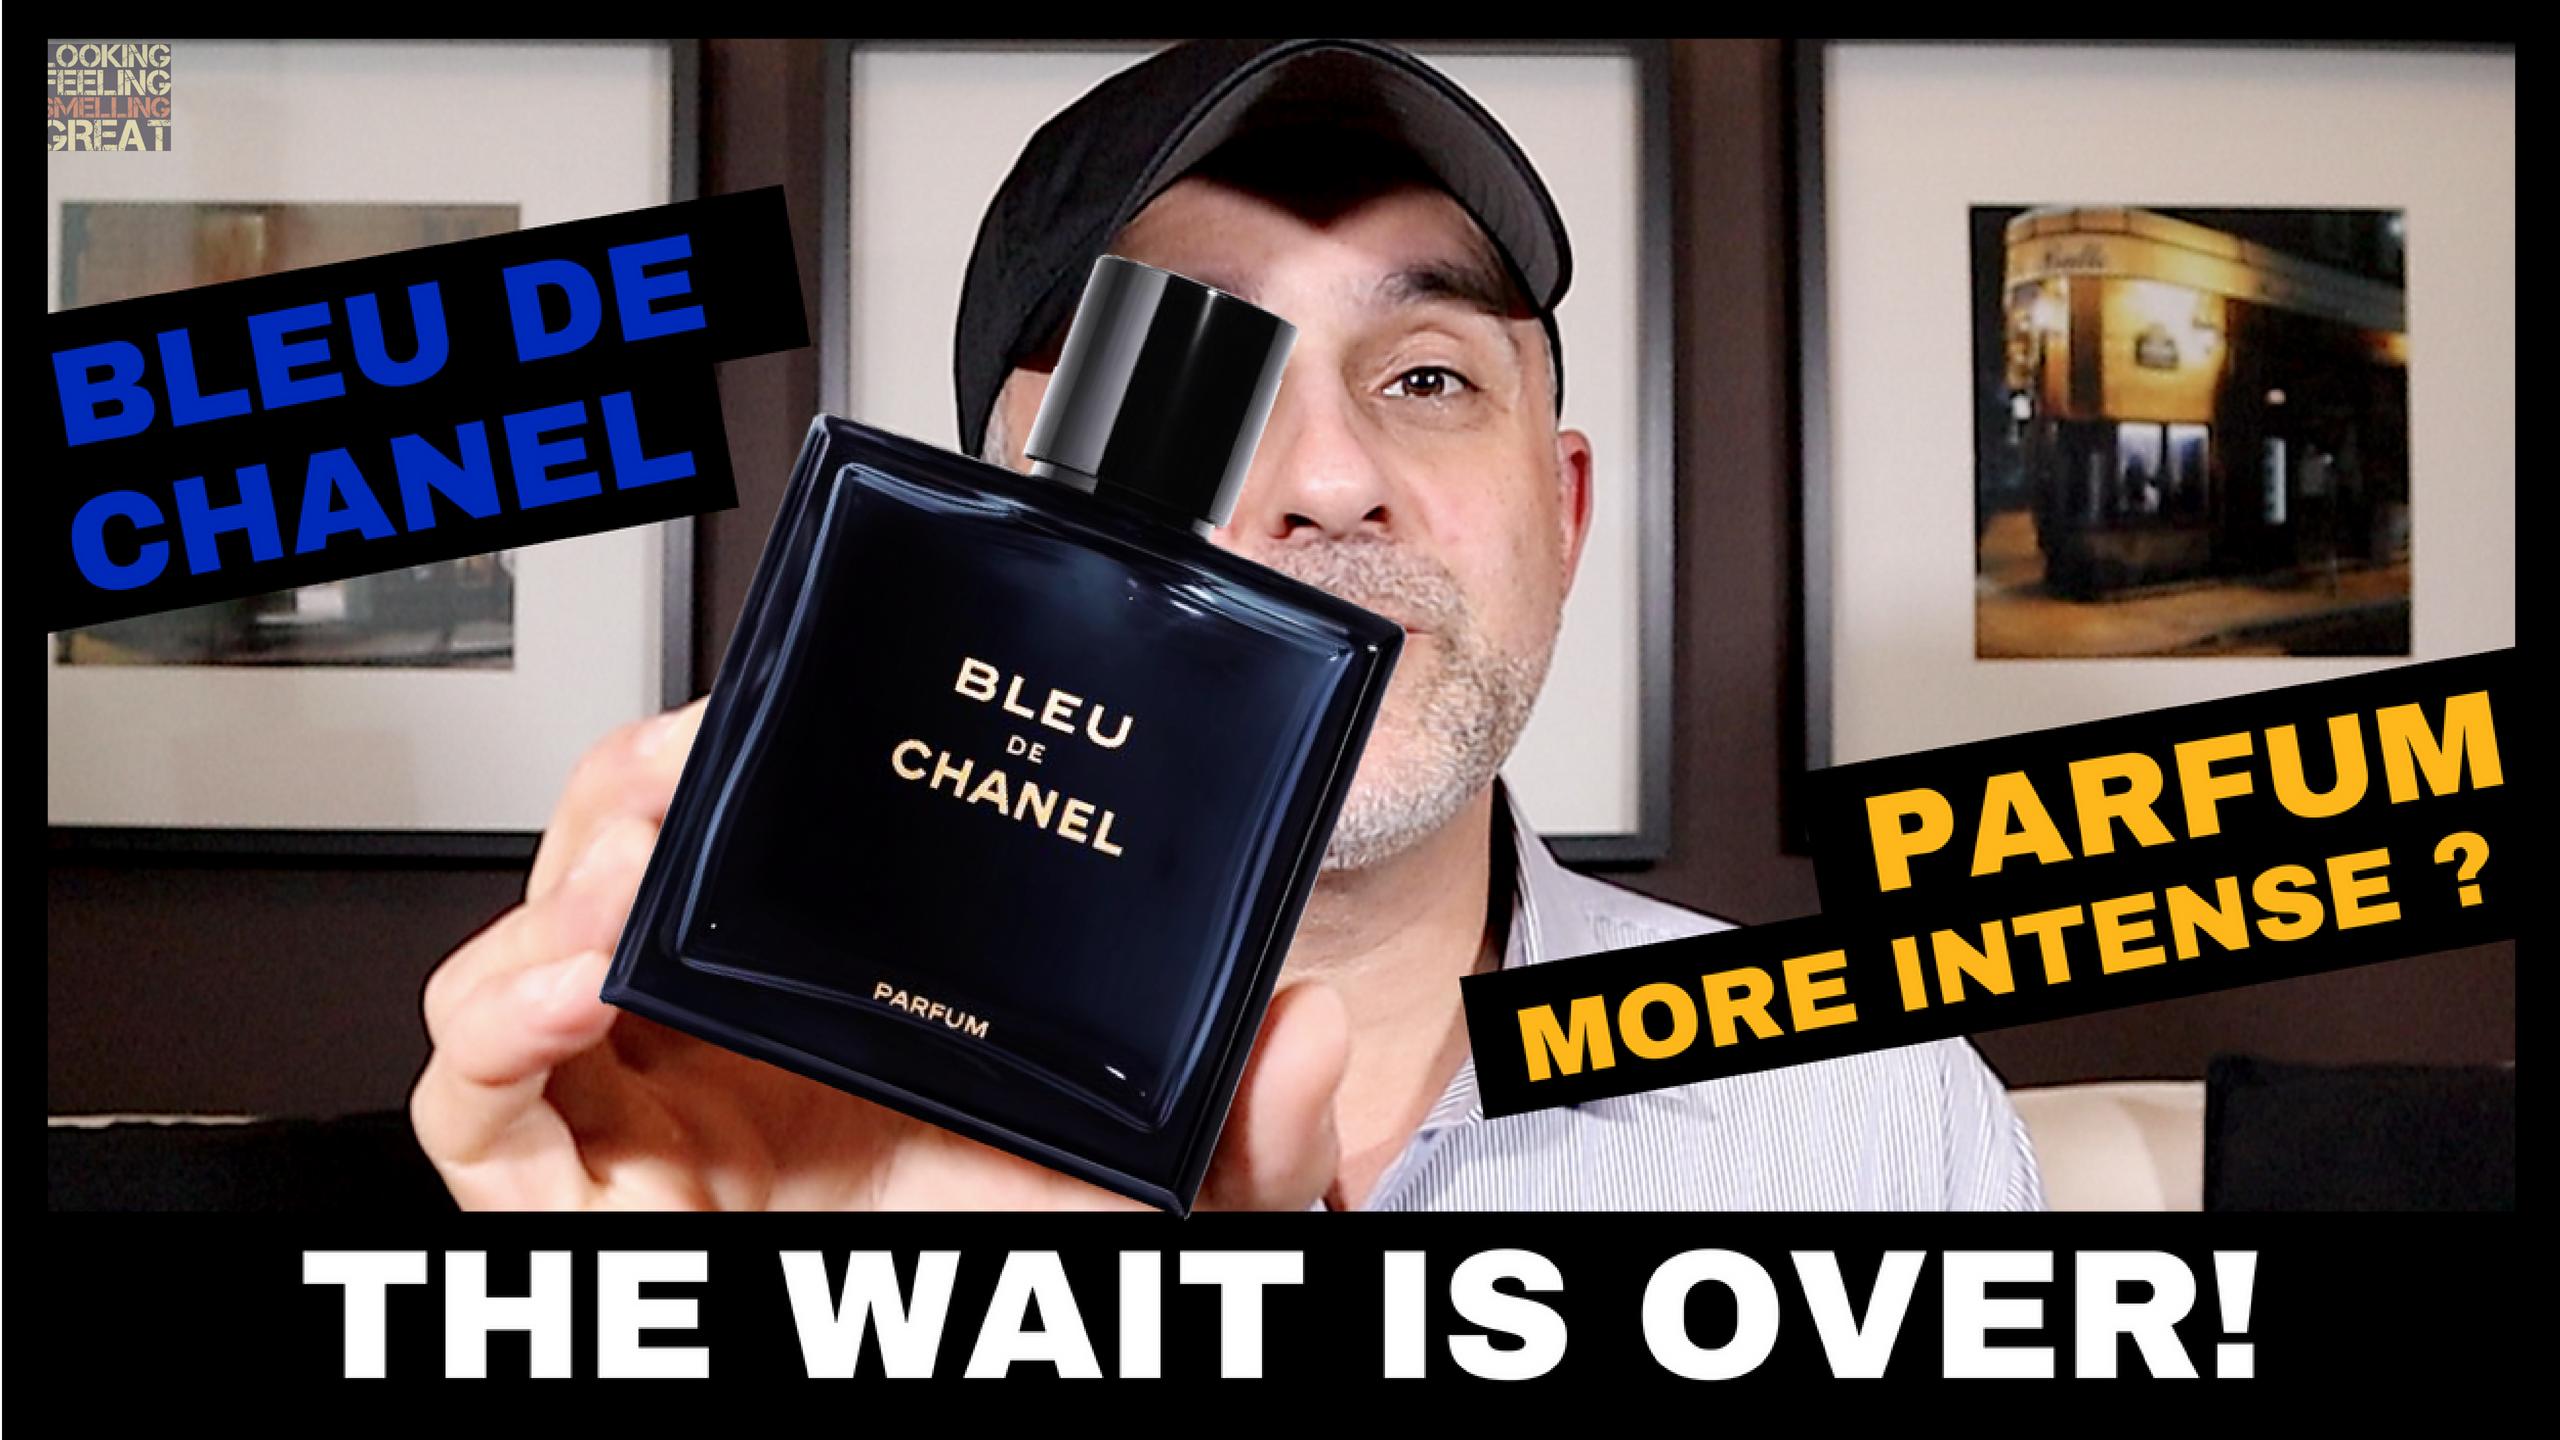 Chanel Bleu De Chanel Parfum Review Looking Feeling Smelling Great